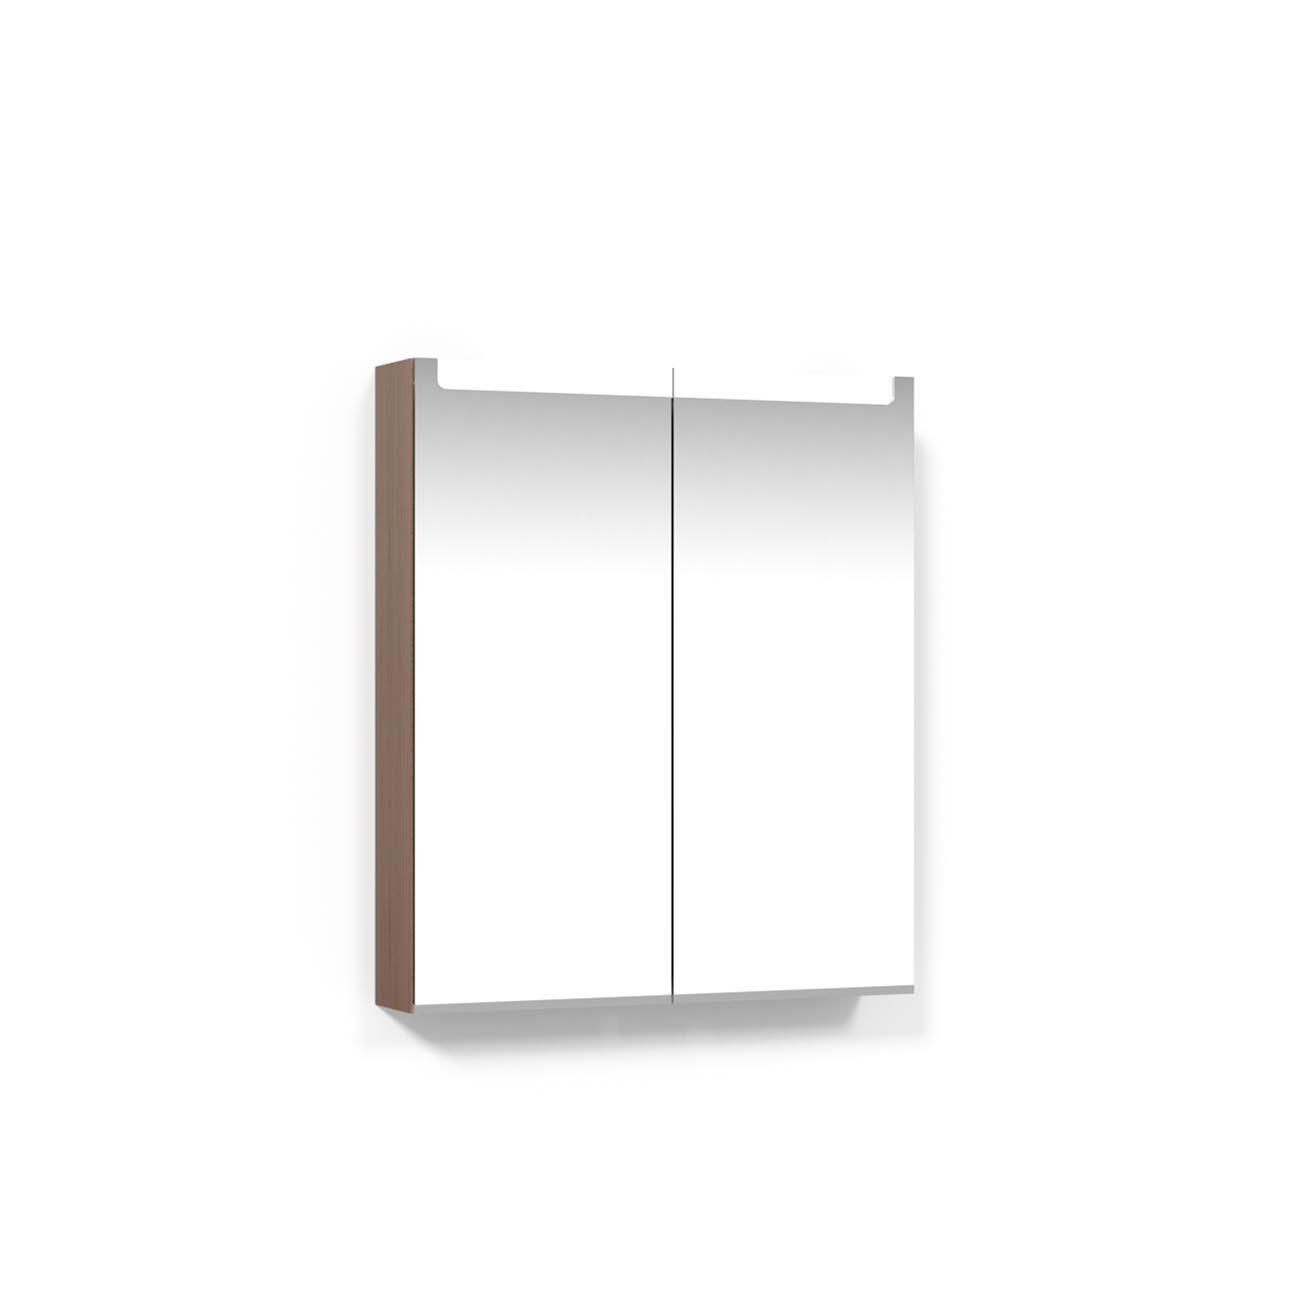 Spegelskåp Macro Design 600 Infälld LED